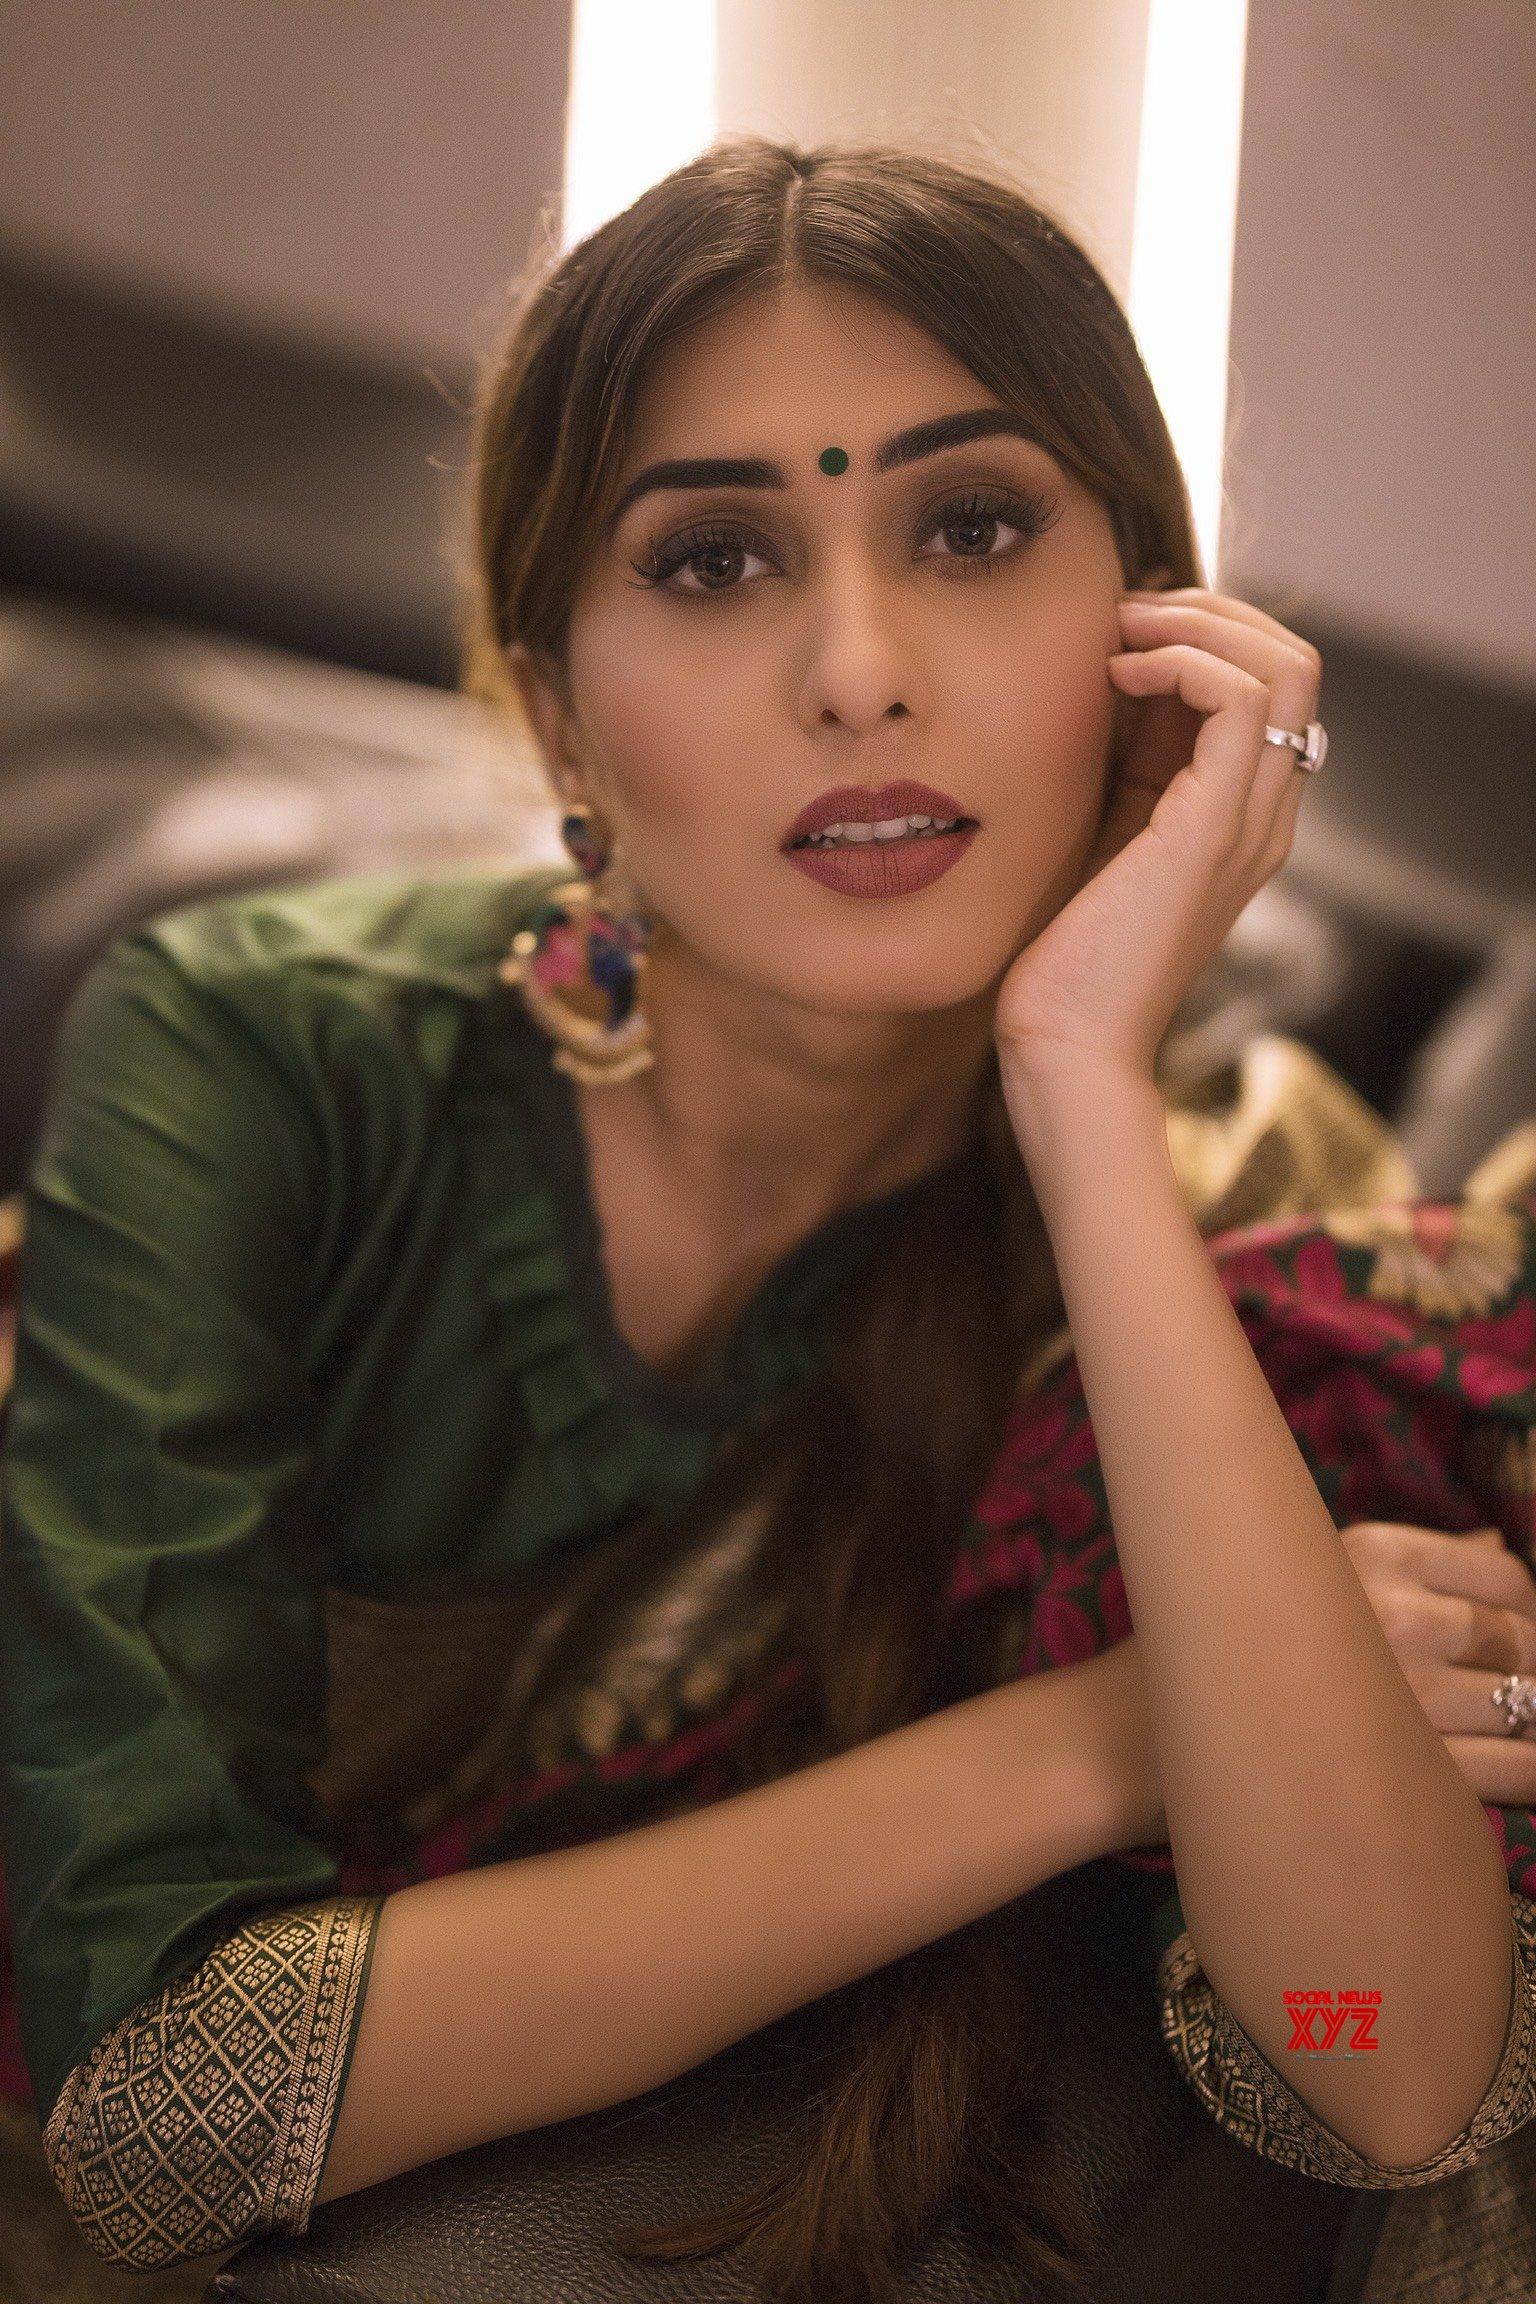 Actress Ruma Sharma's Glam Stills From A Saree Photo Shoot For Yadu Nandan Fashions